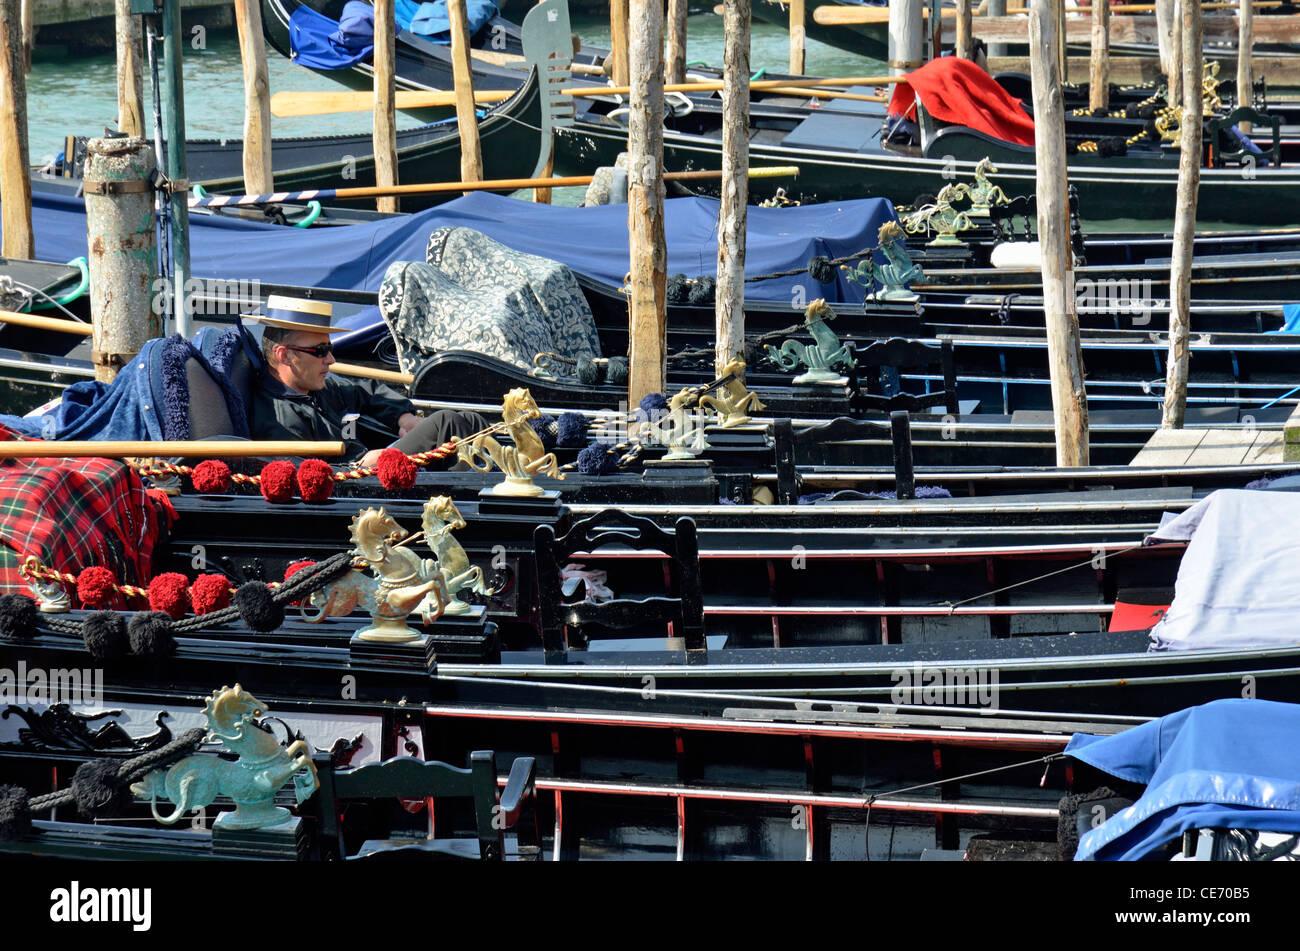 Gondolier resting in moored gondola, Venice, Italy - Stock Image